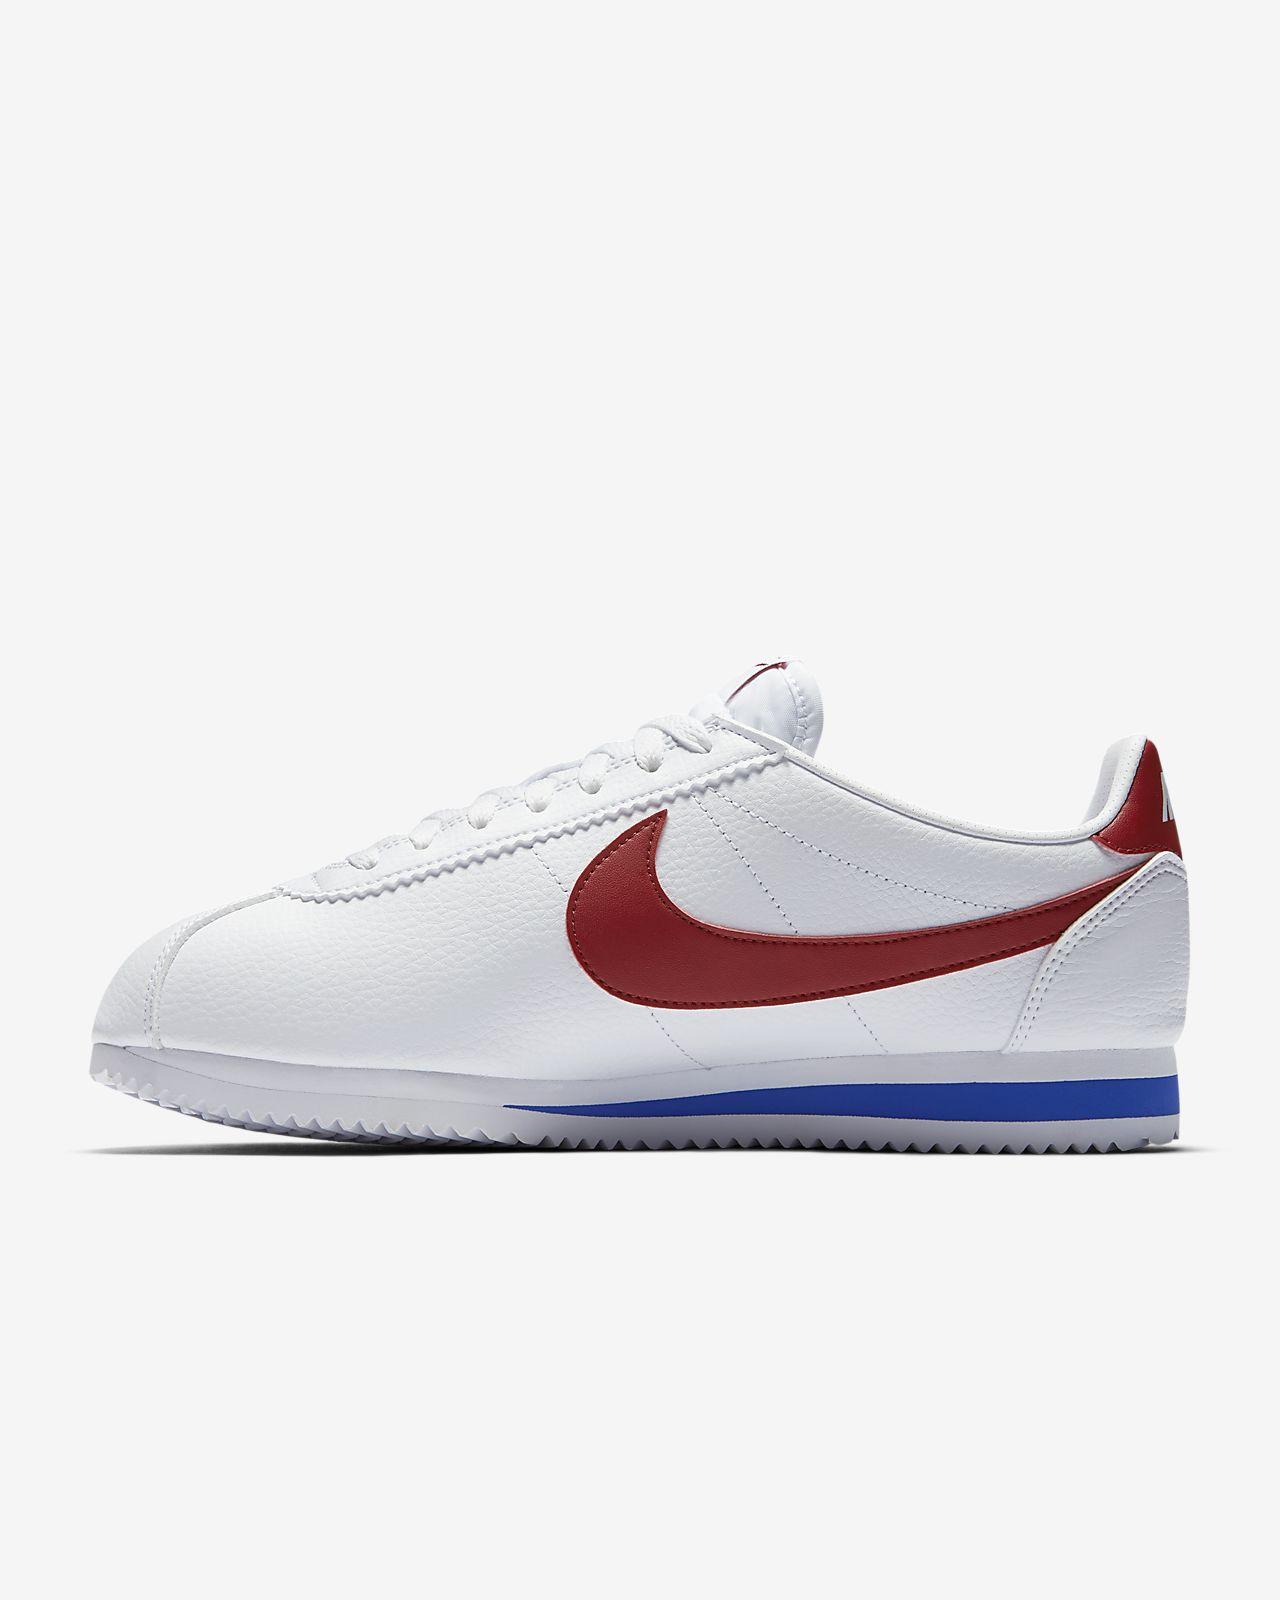 new concept 9b01f e2046 ... Sko Nike Classic Cortez för män